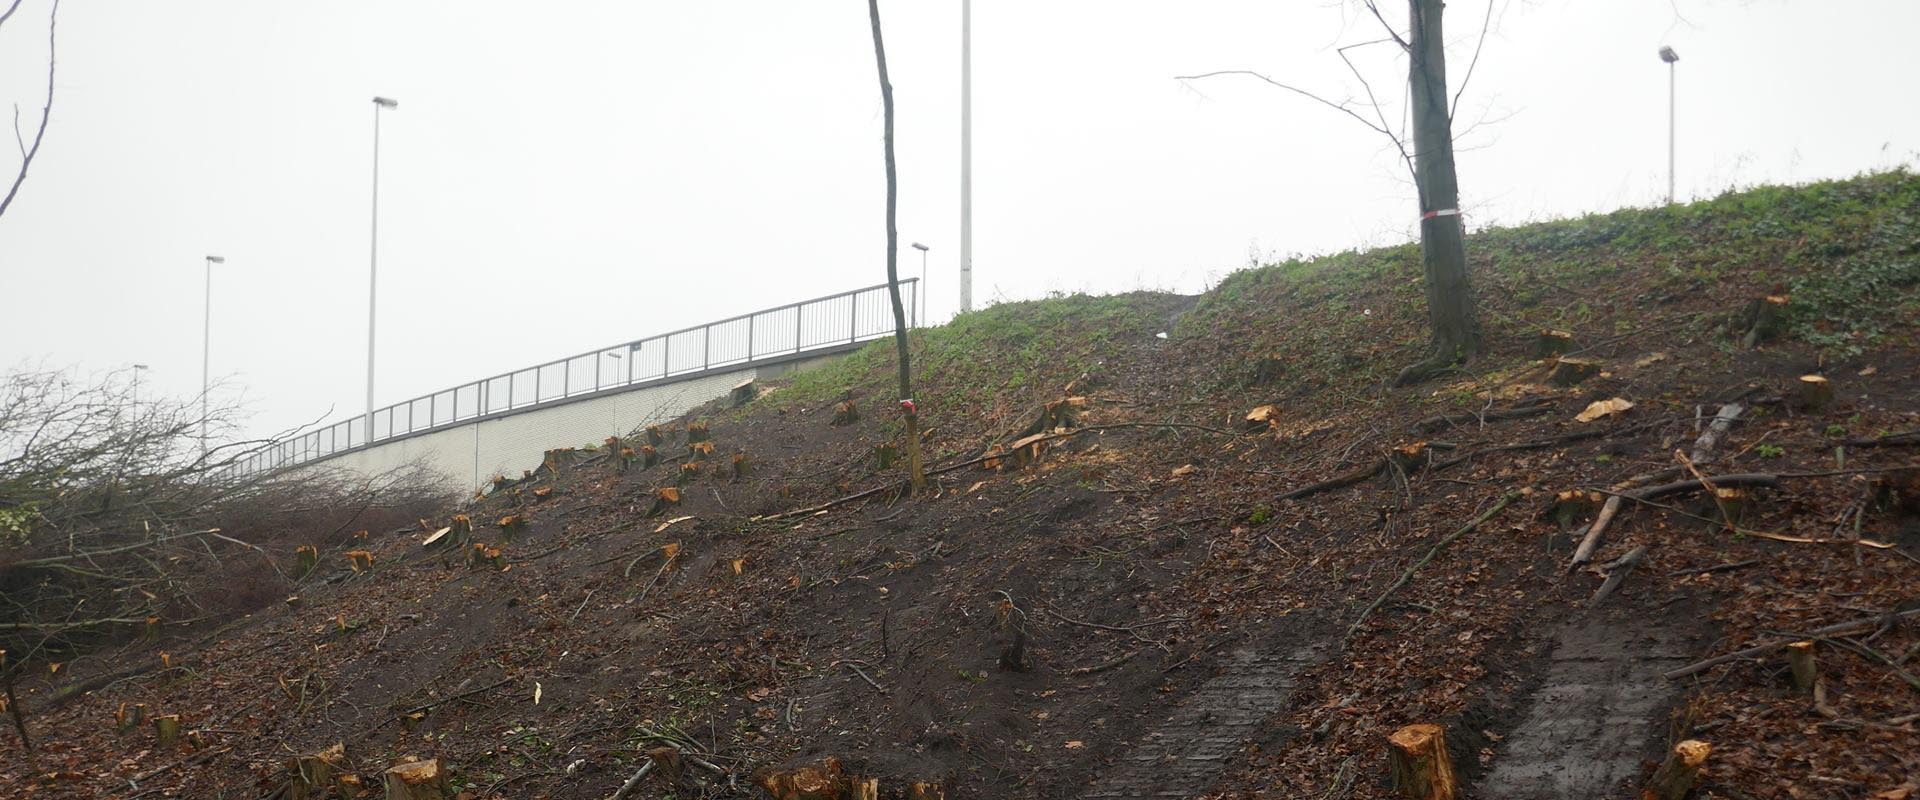 Wegen en verkeer kapt groenbuffer aan Katelijne-eiland kaal